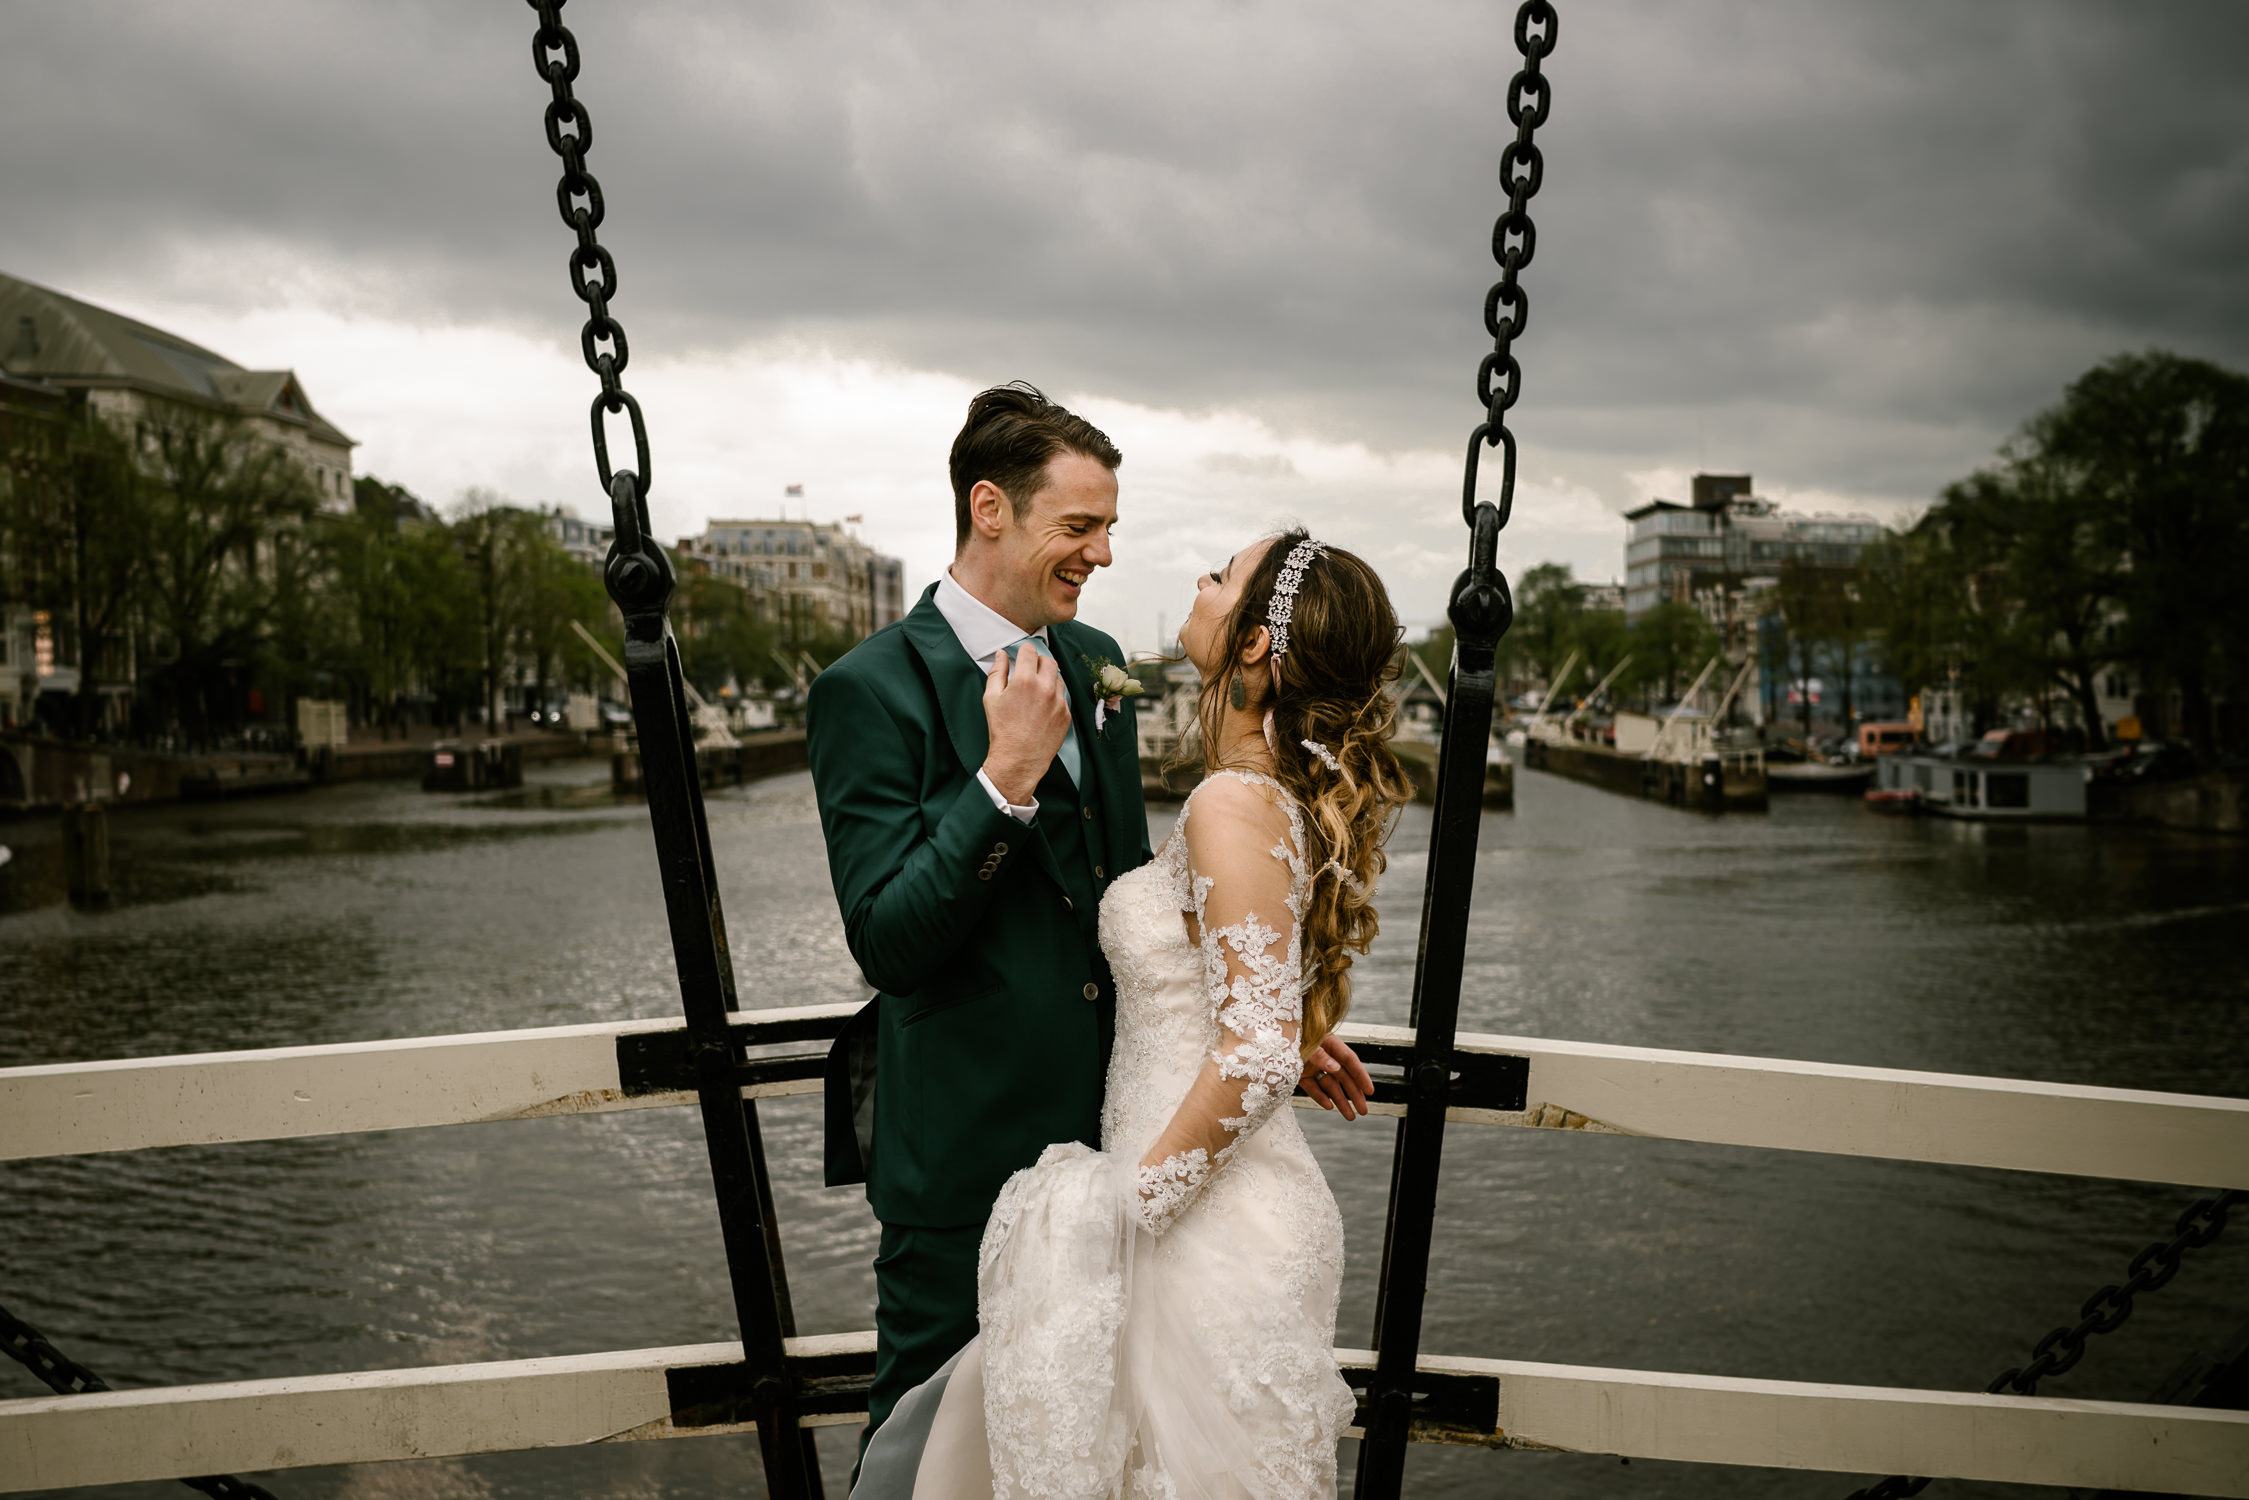 bruidsfotografie-amsterdam-utrecht-trouwfotograaf-mark-hadden-wedding-photography-Robin & Guus-070.jpg